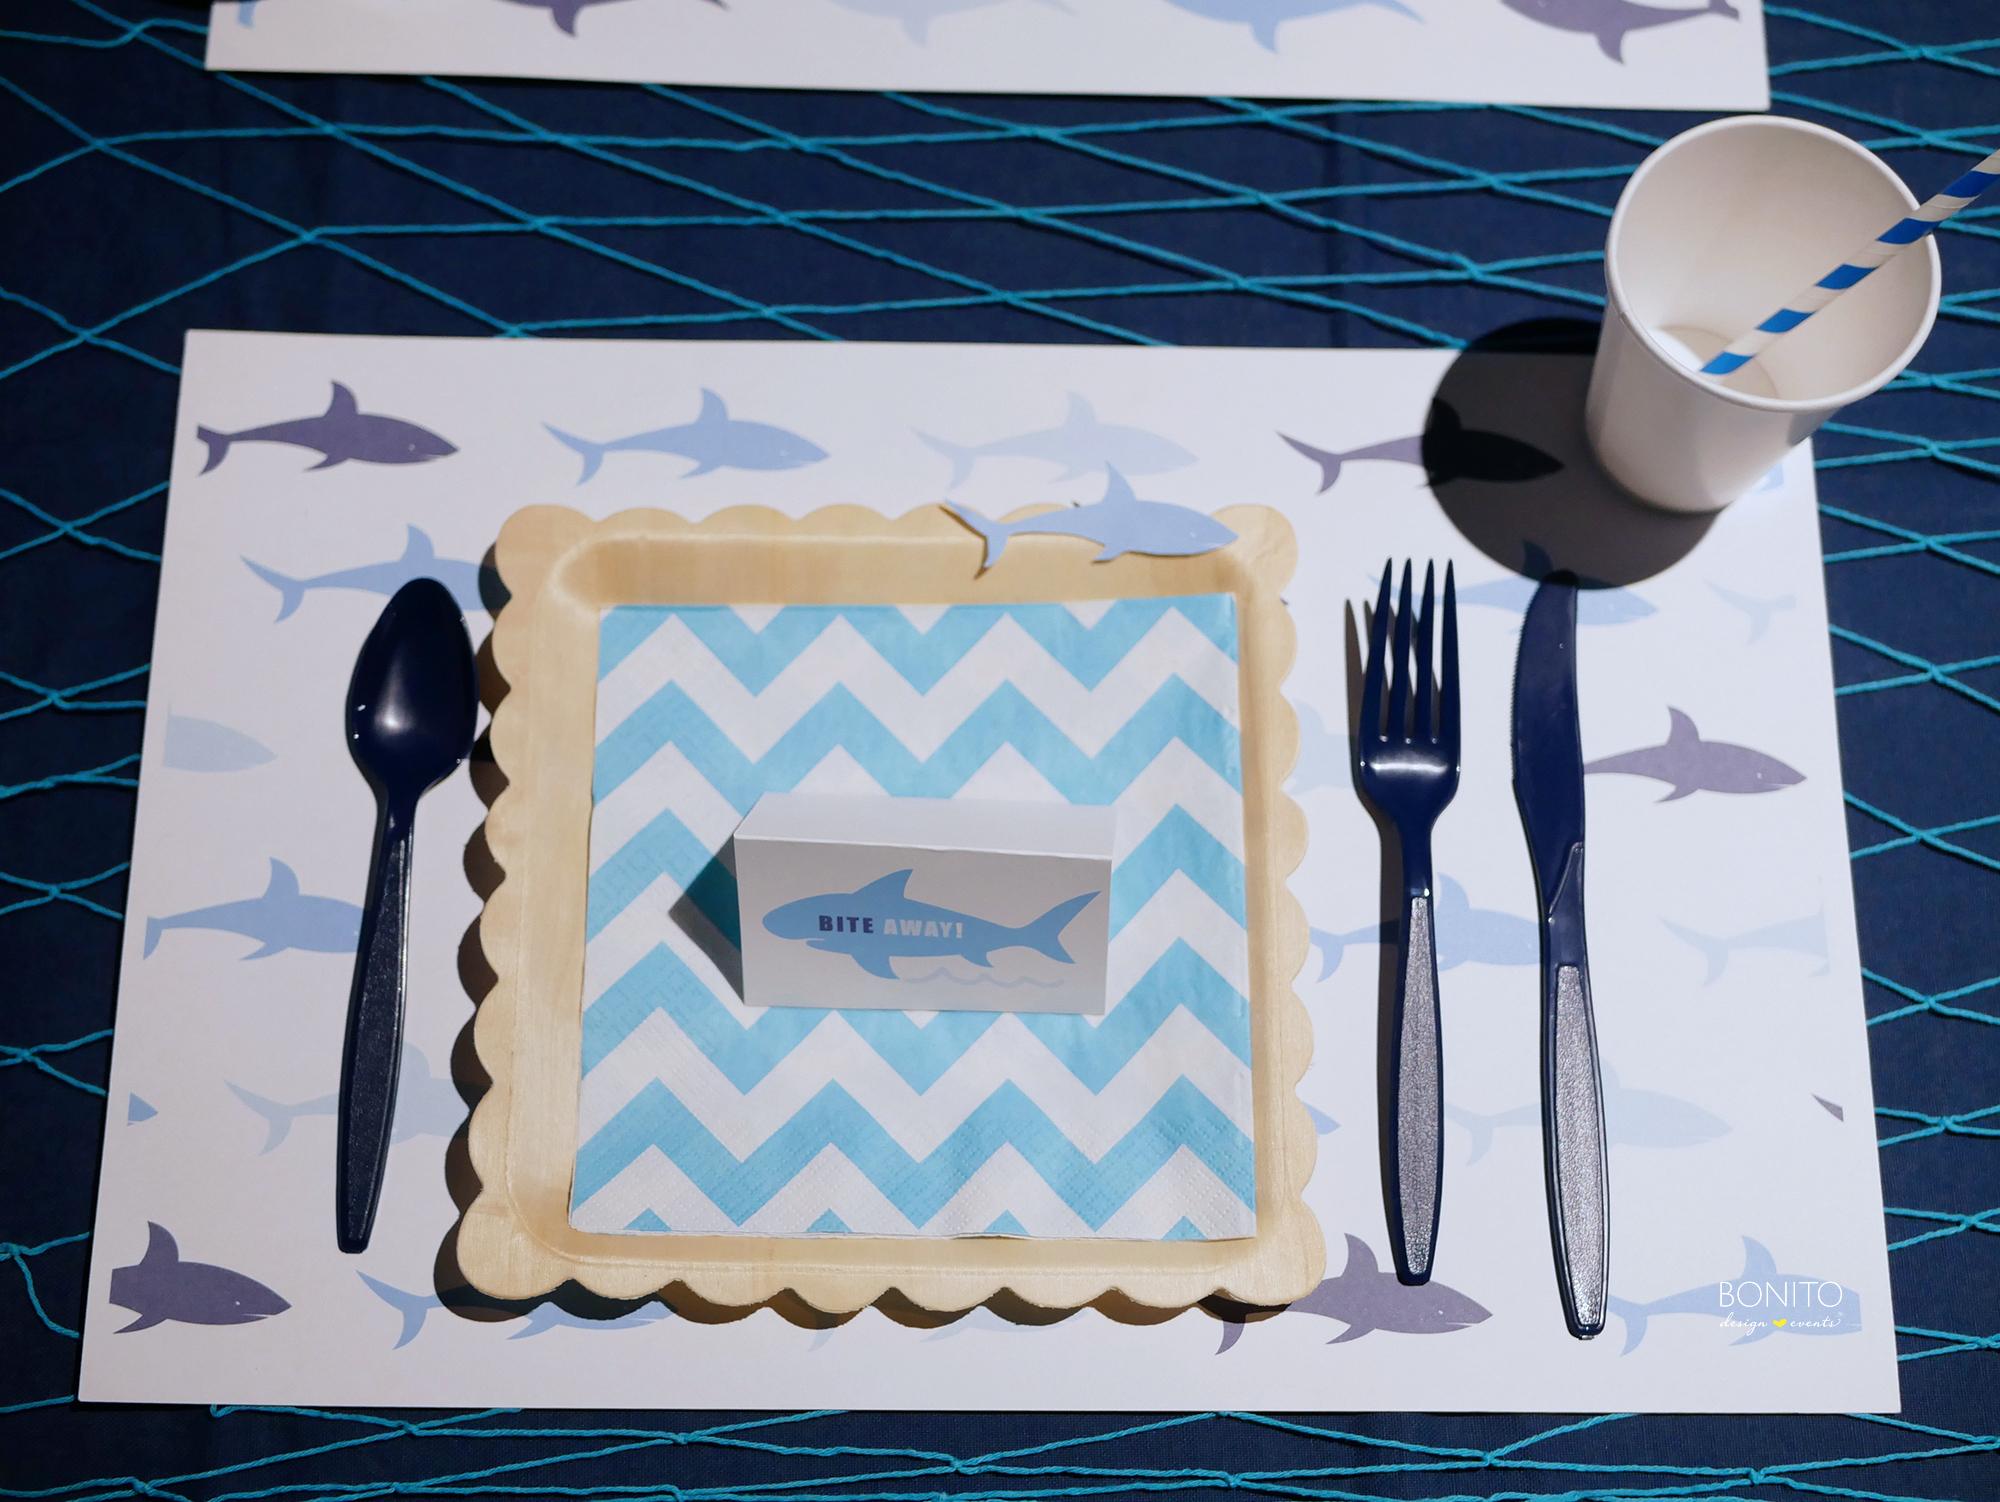 Bonito Design Events Shark 2 18.jpg